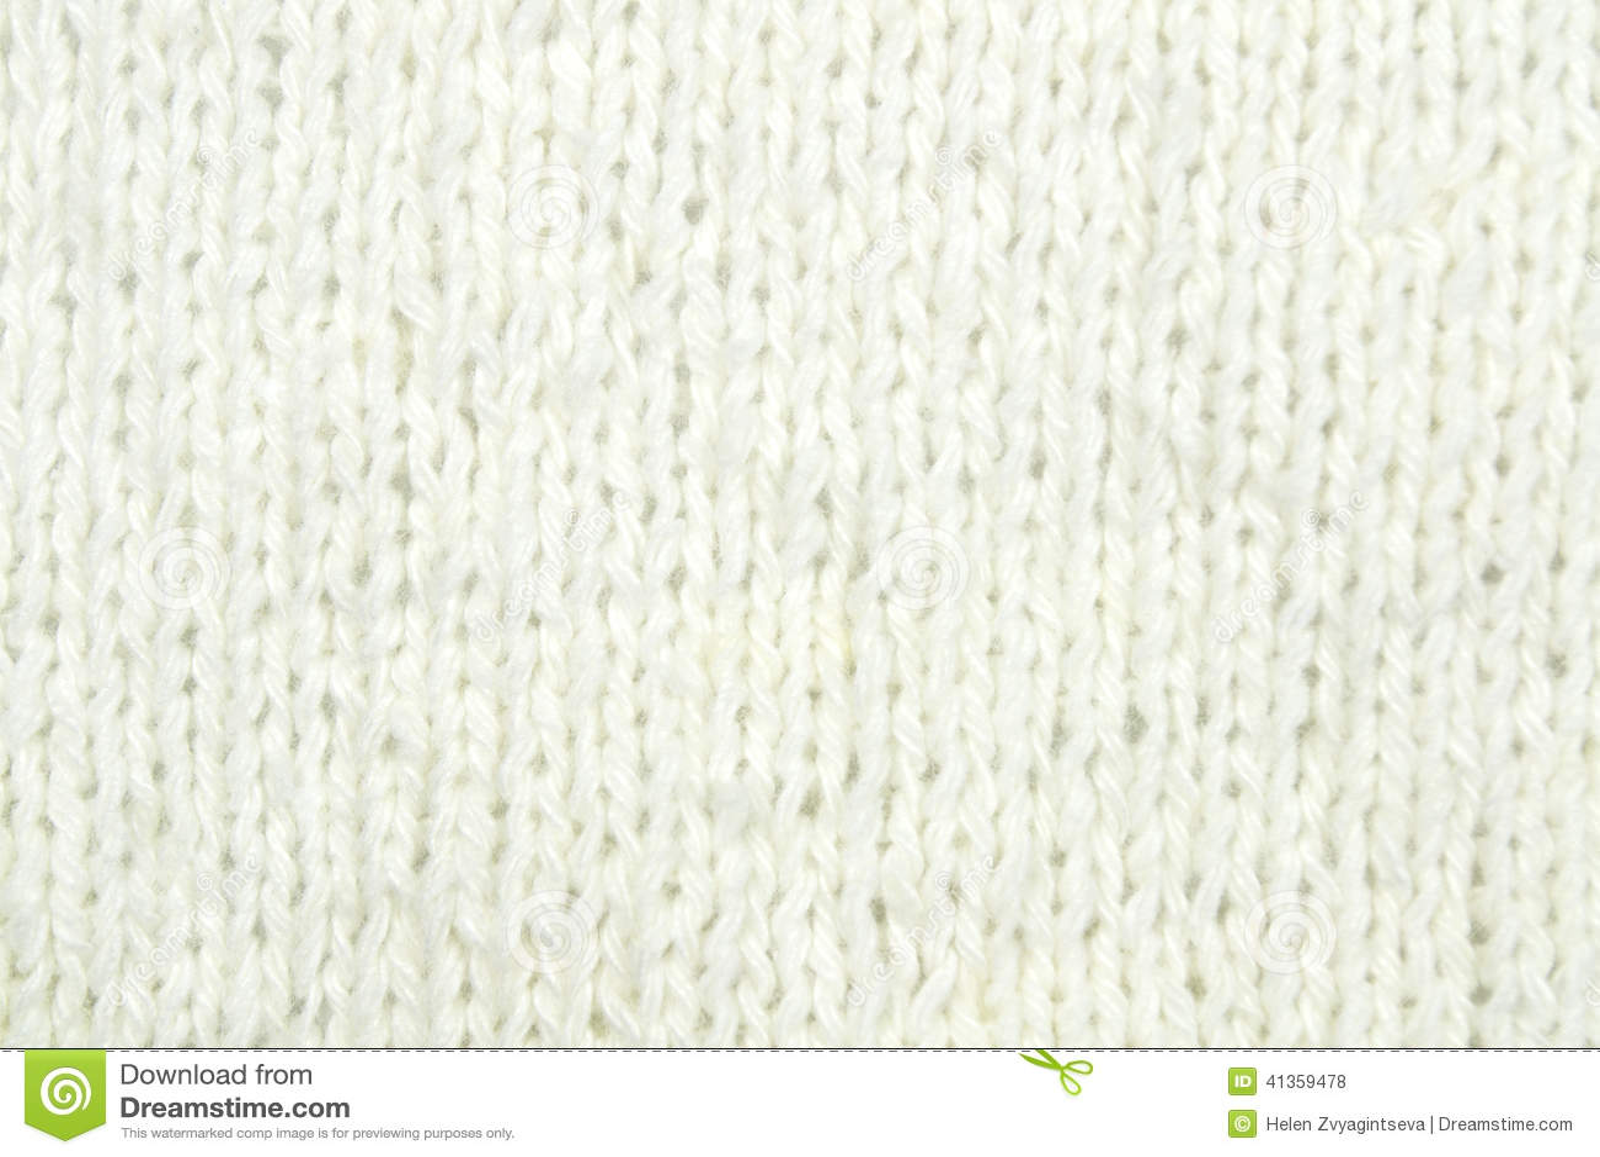 White Knitting Wool Texture Background Stock Photo - Image ...